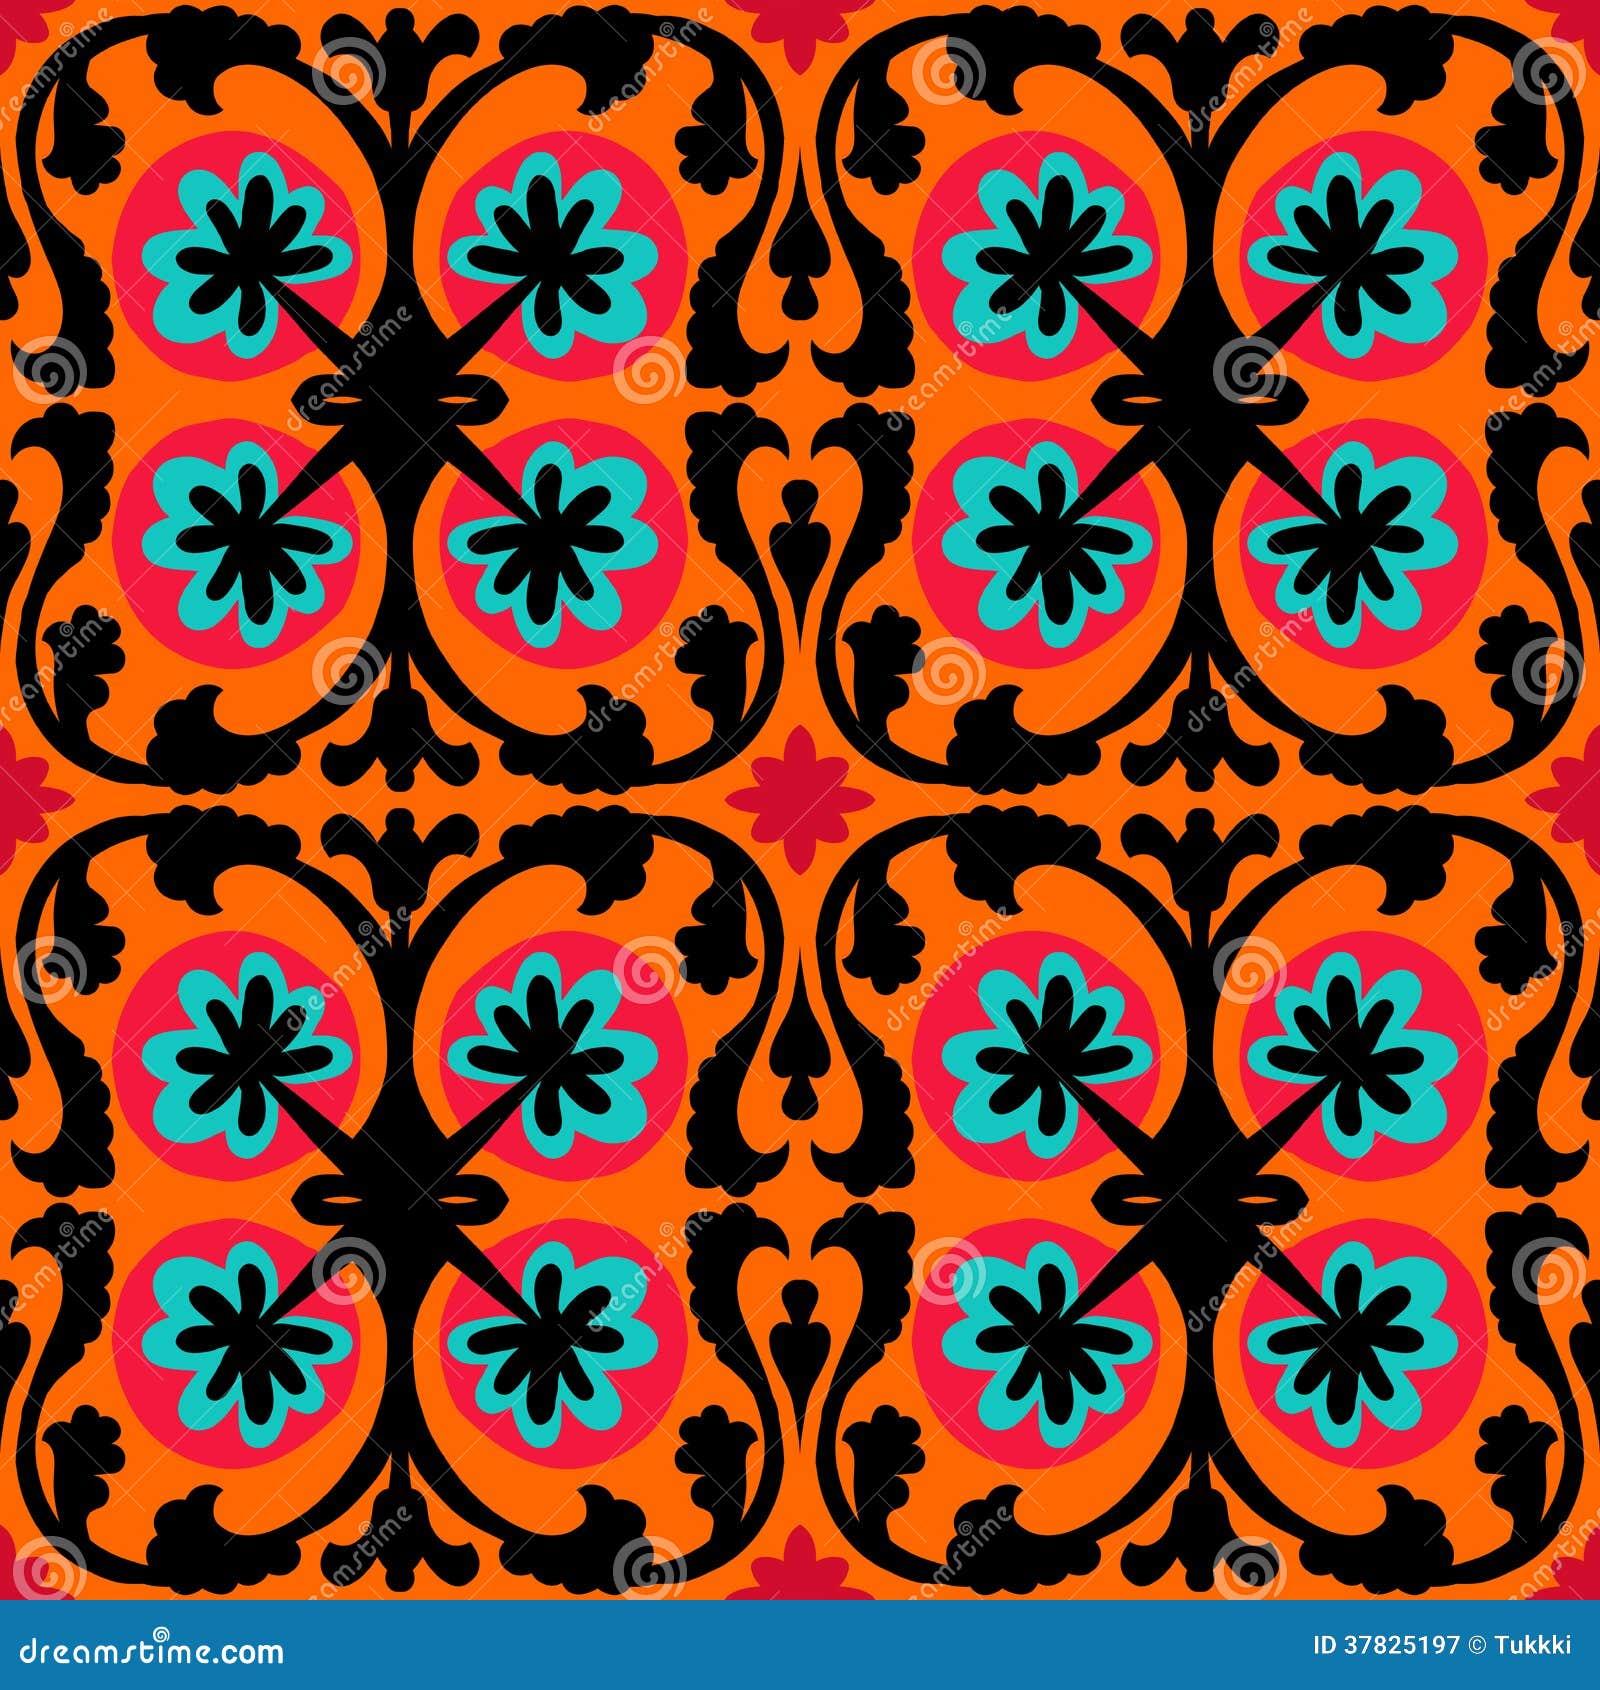 Turkish Home Decor Suzani Pattern With Uzbek And Kazakh Motifs Stock Image